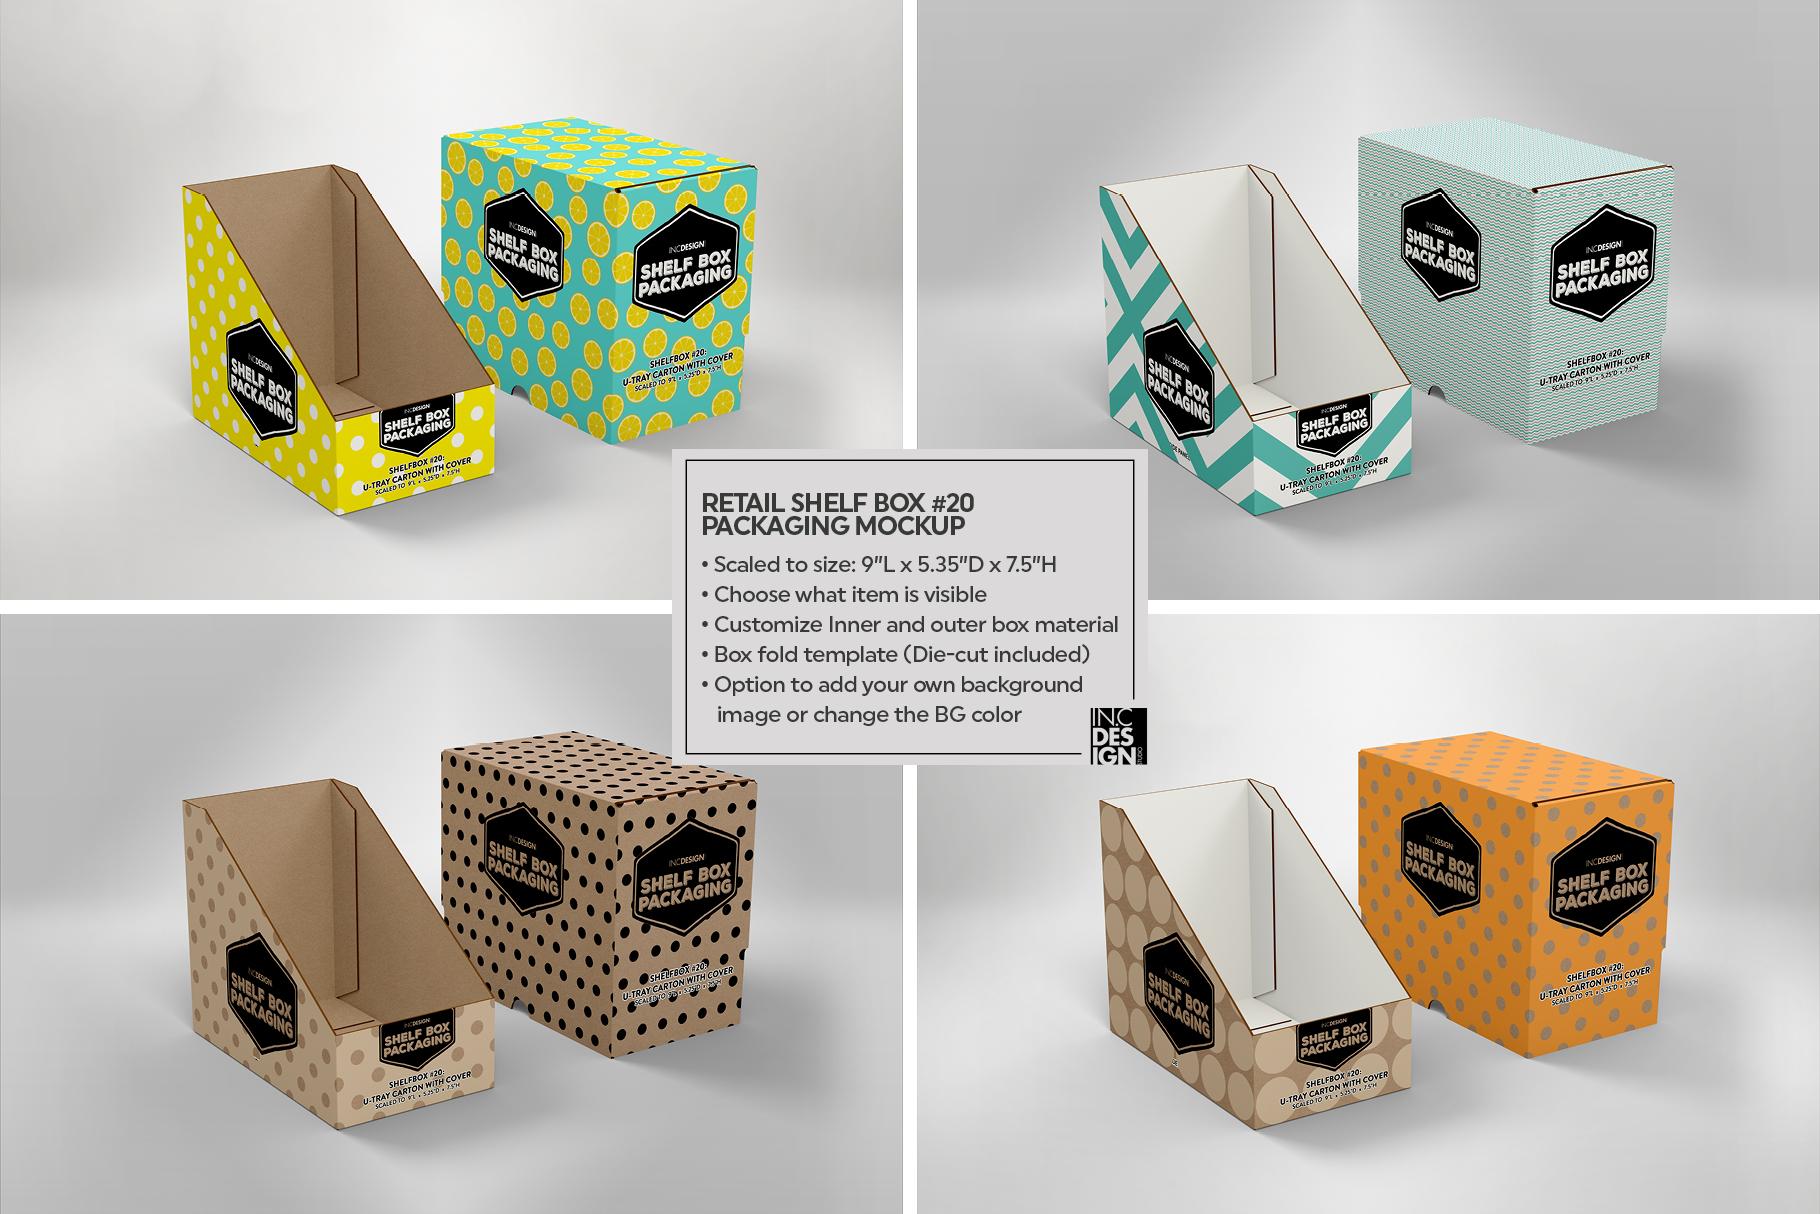 Retail Shelf Box 20 Packaging Mockup example image 4